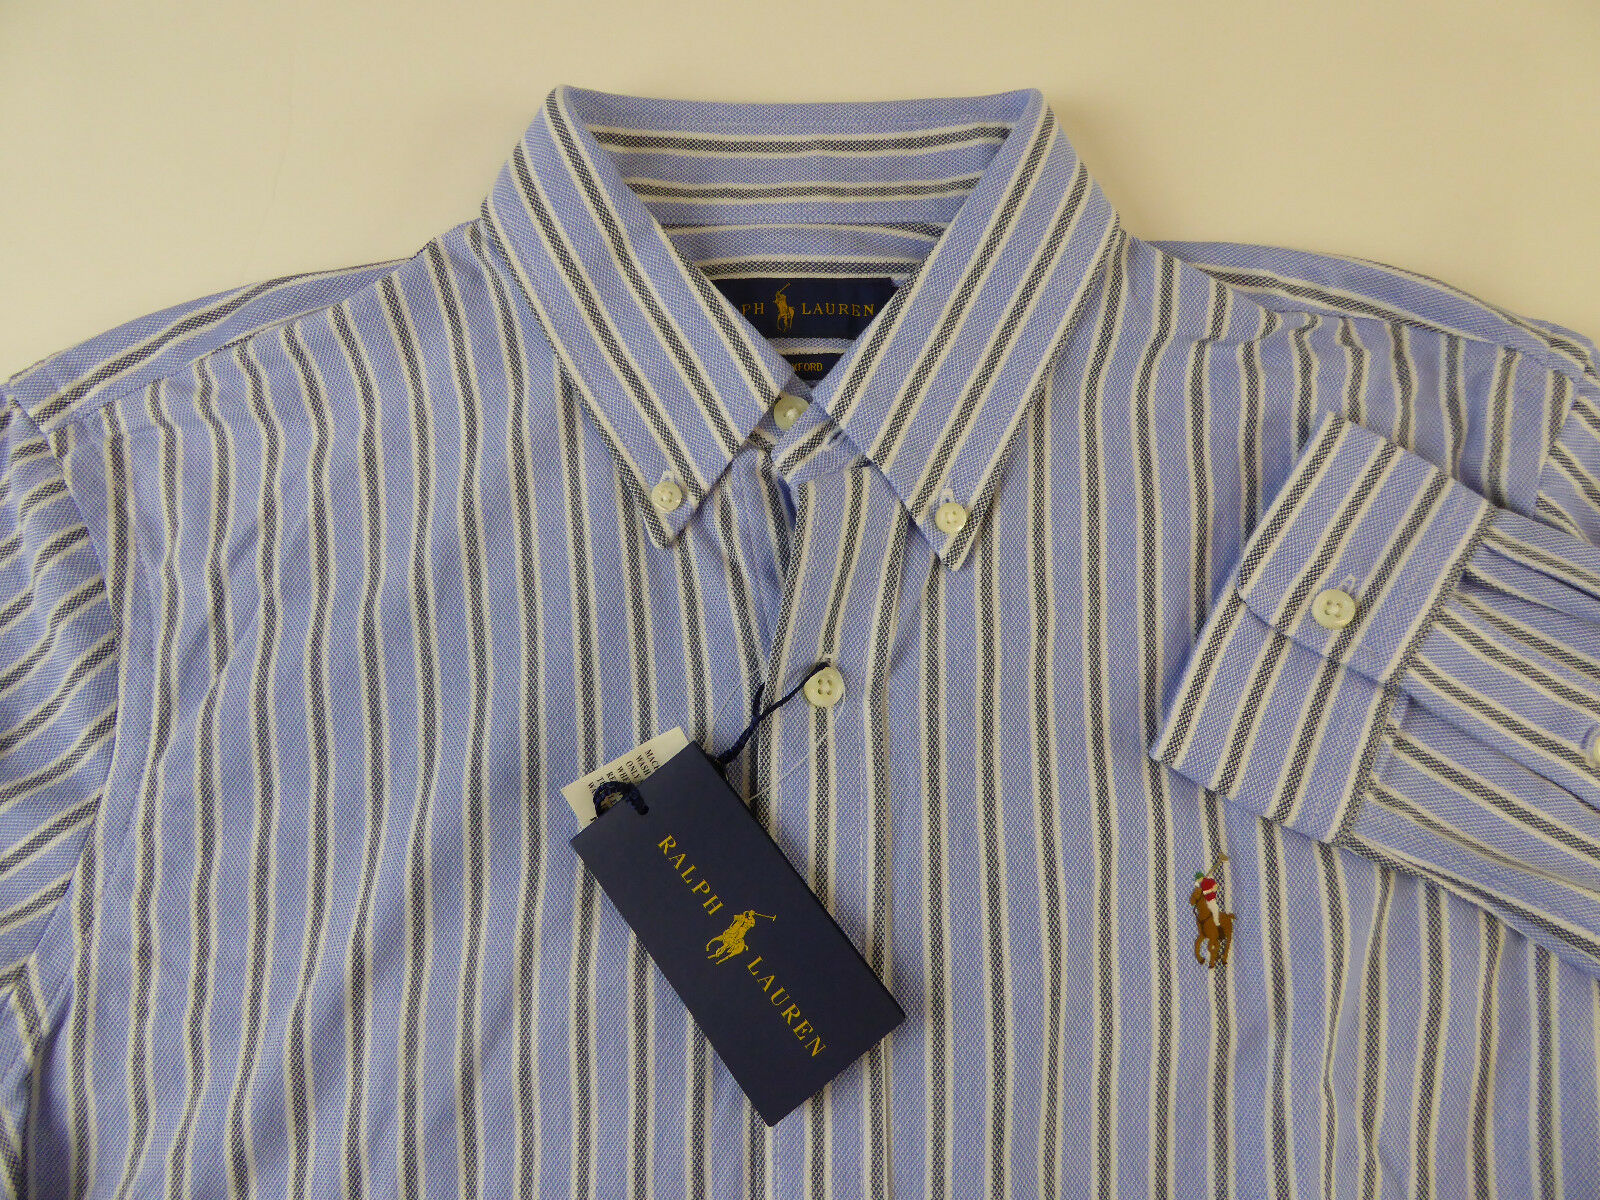 Polo Ralph Lauren Long Sleeve Striped Knit Oxford Cotton Shirt w Pony 98.50 NWT